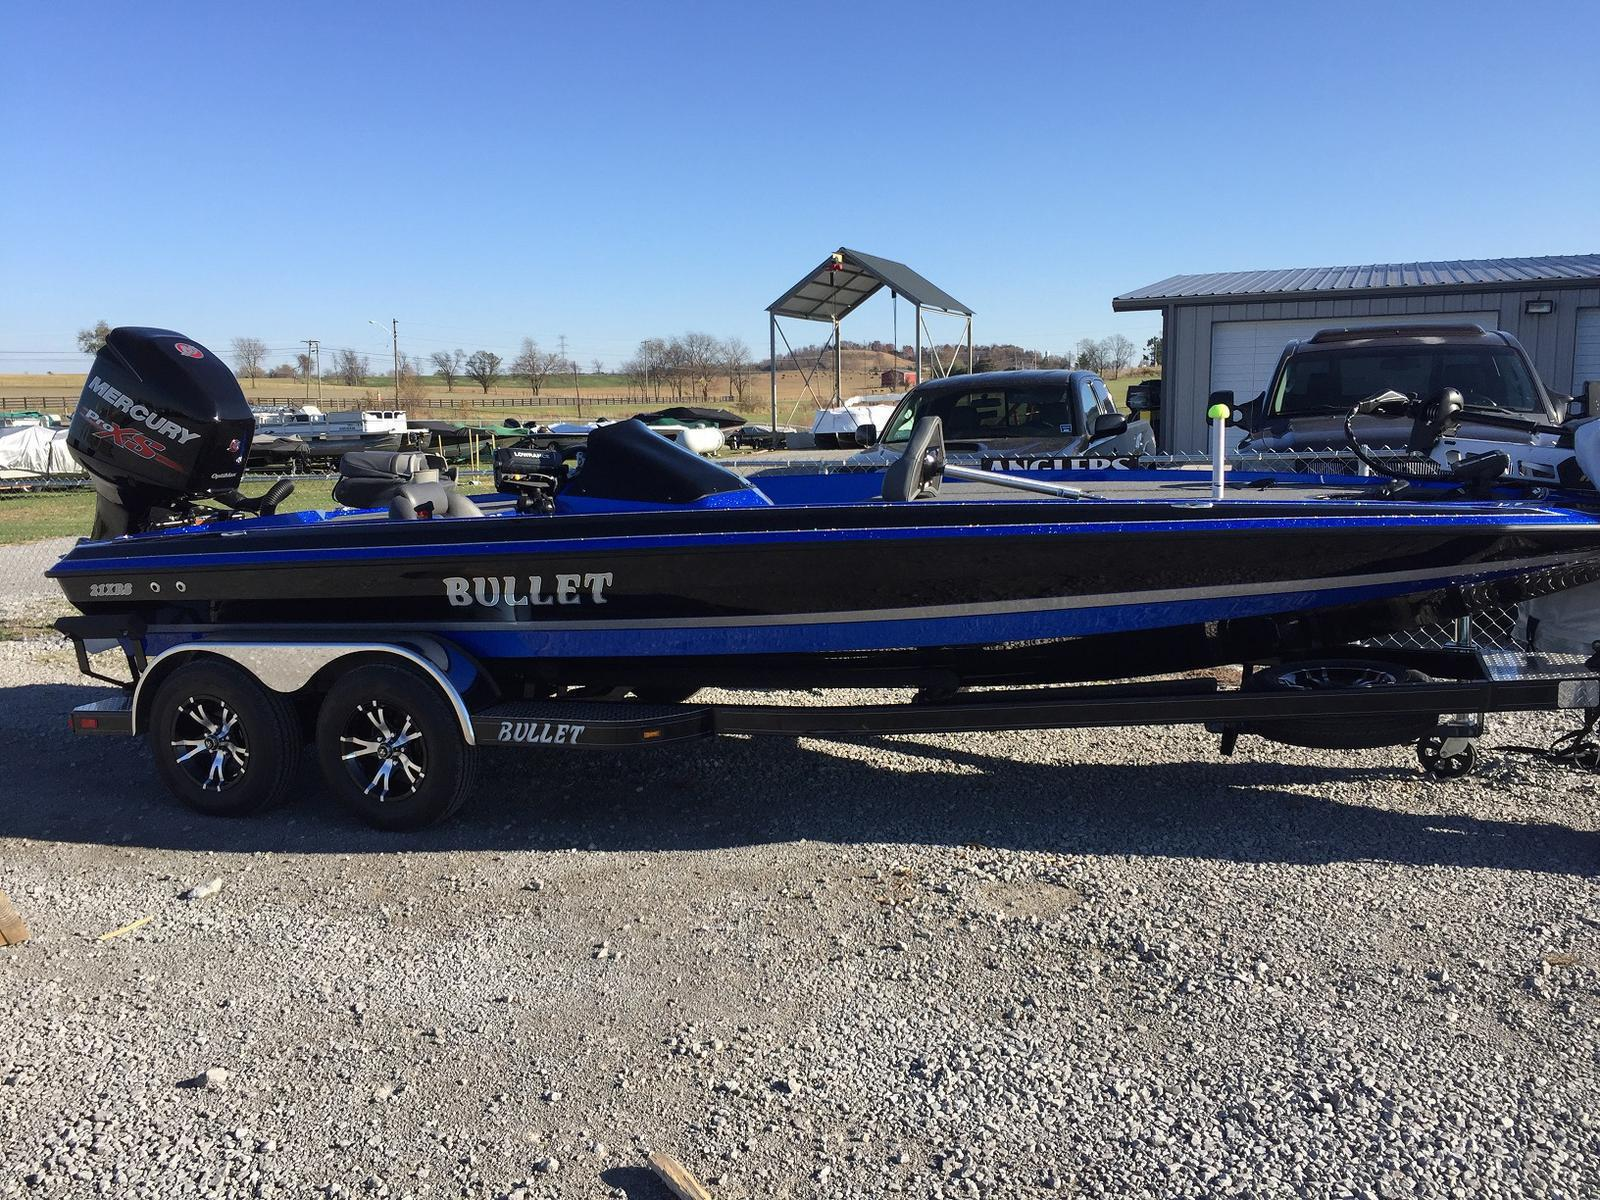 2017 bullet 21xrs 21 foot 2017 bullet boat in lancaster ky